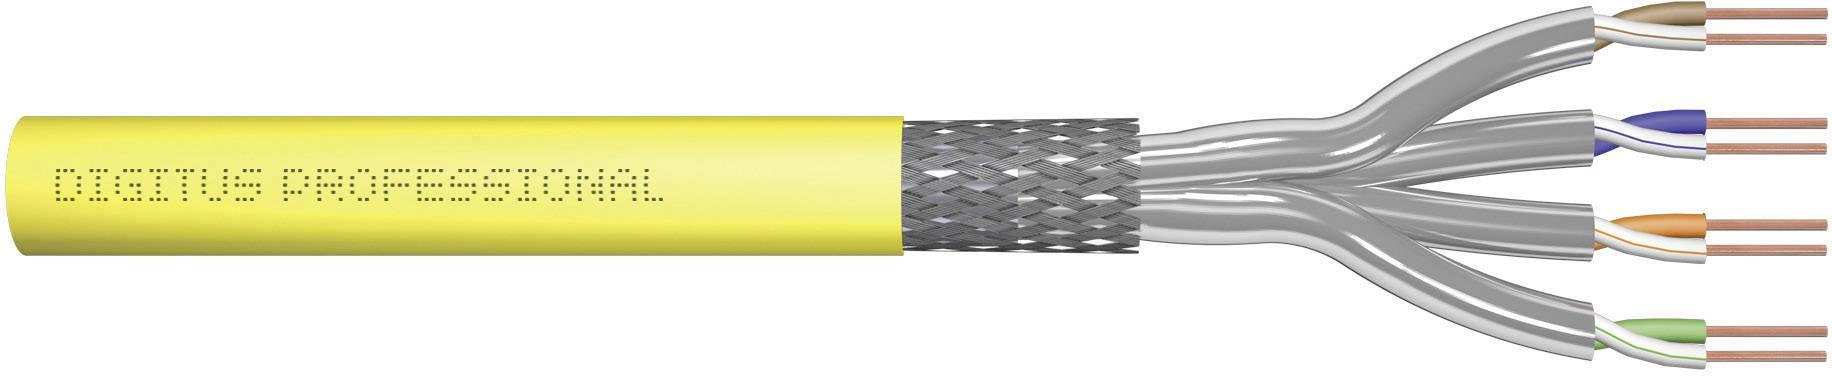 Ethernetový síťový kabel CAT 7a Digitus Professional DK-1743-A-VH-10, S/FTP, 4 x 2 x 0.32 mm², žlutá, 1000 m